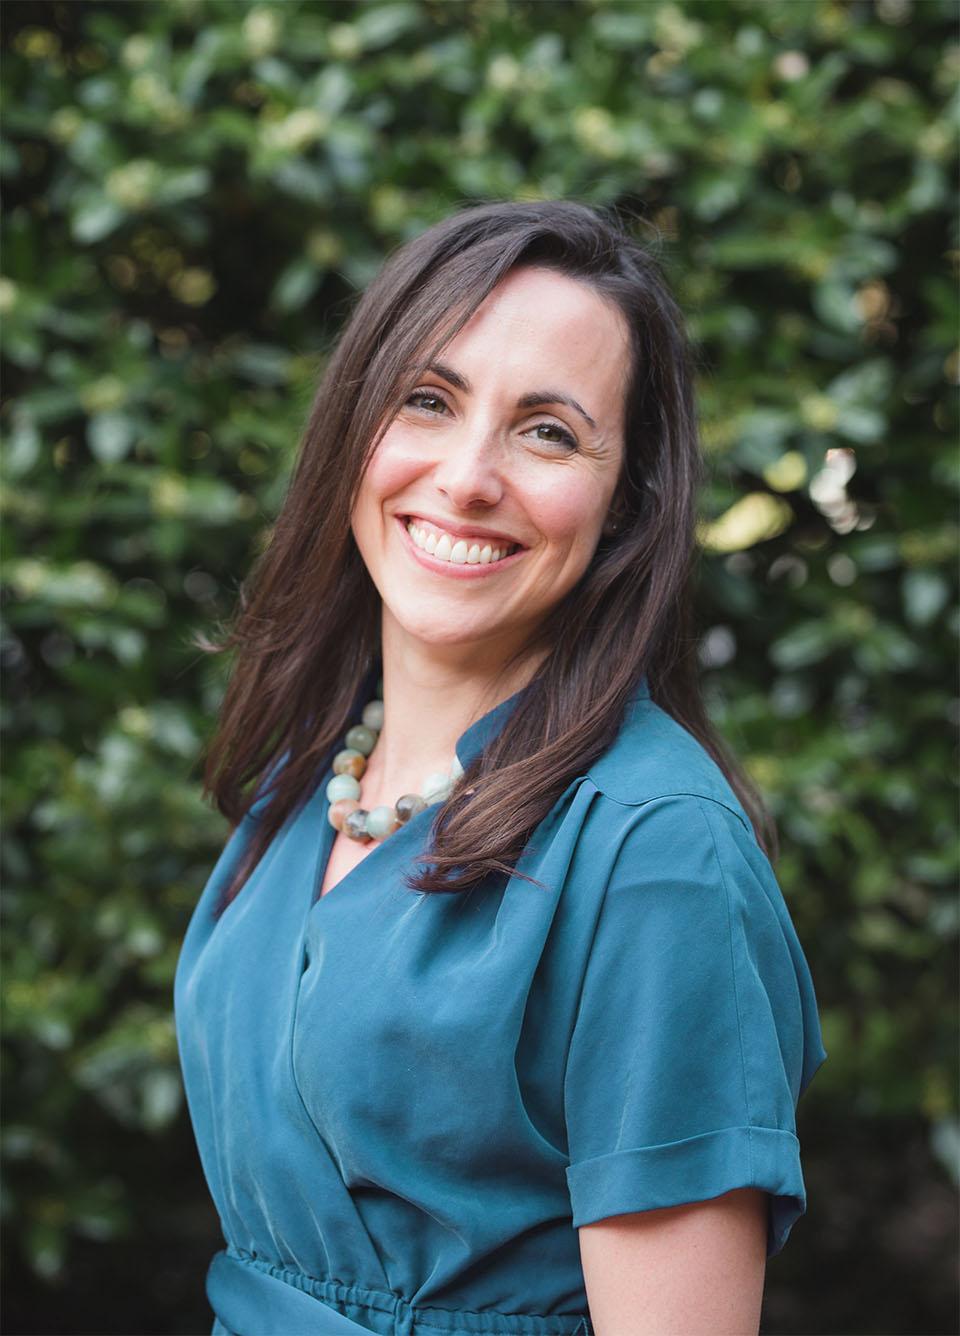 Lauren Zangardi Haynes is a CIMA®, CFP® Fee-Only Financial Advisor offering custom Small Business 401(k) Plans in Richmond Virginia